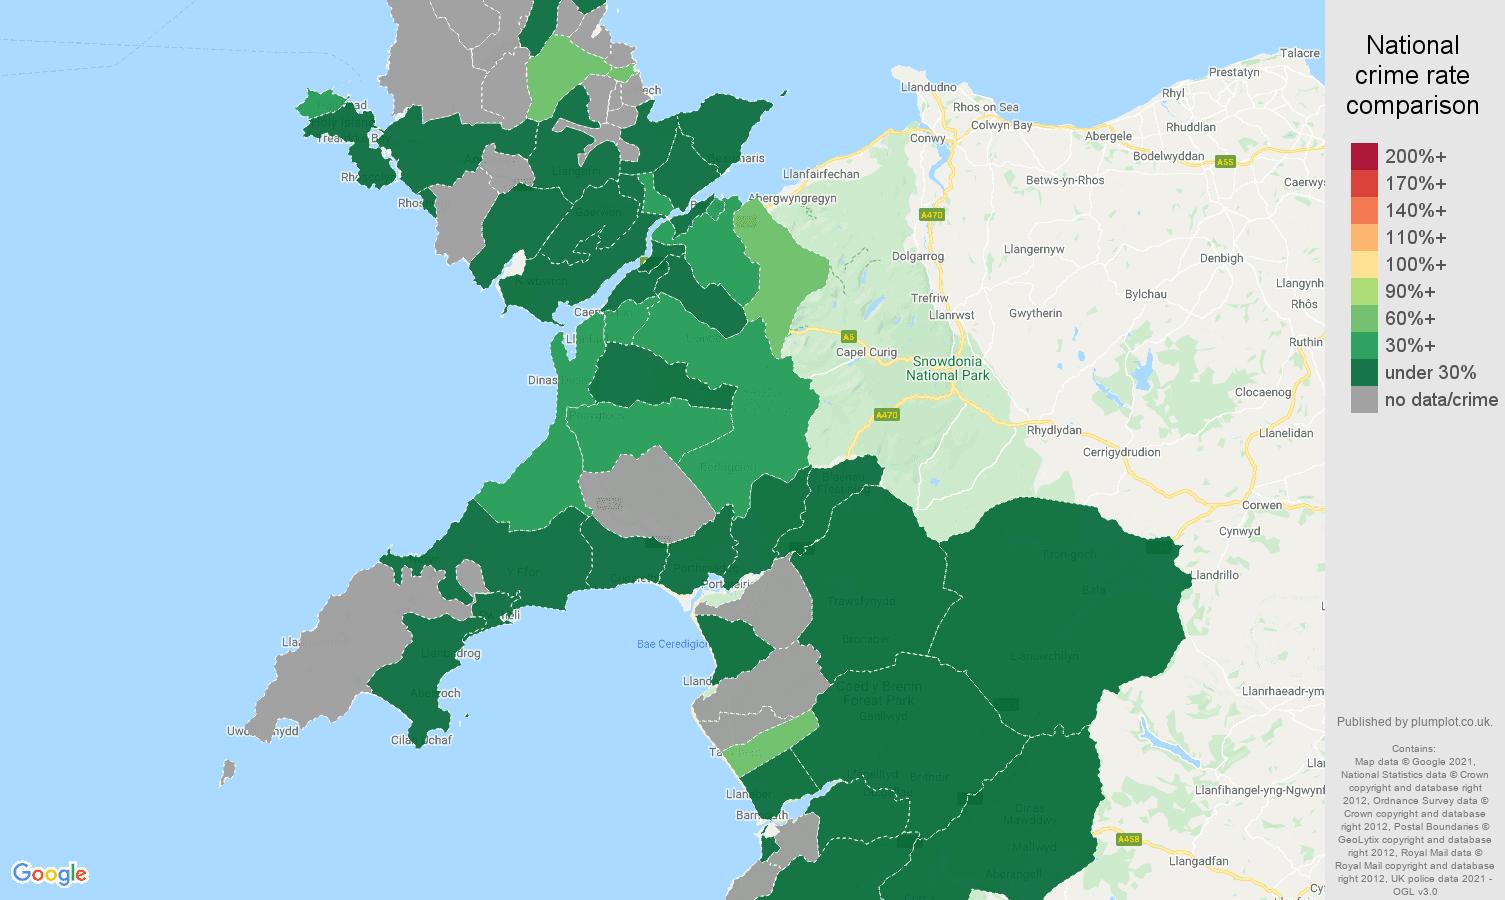 Gwynedd vehicle crime rate comparison map